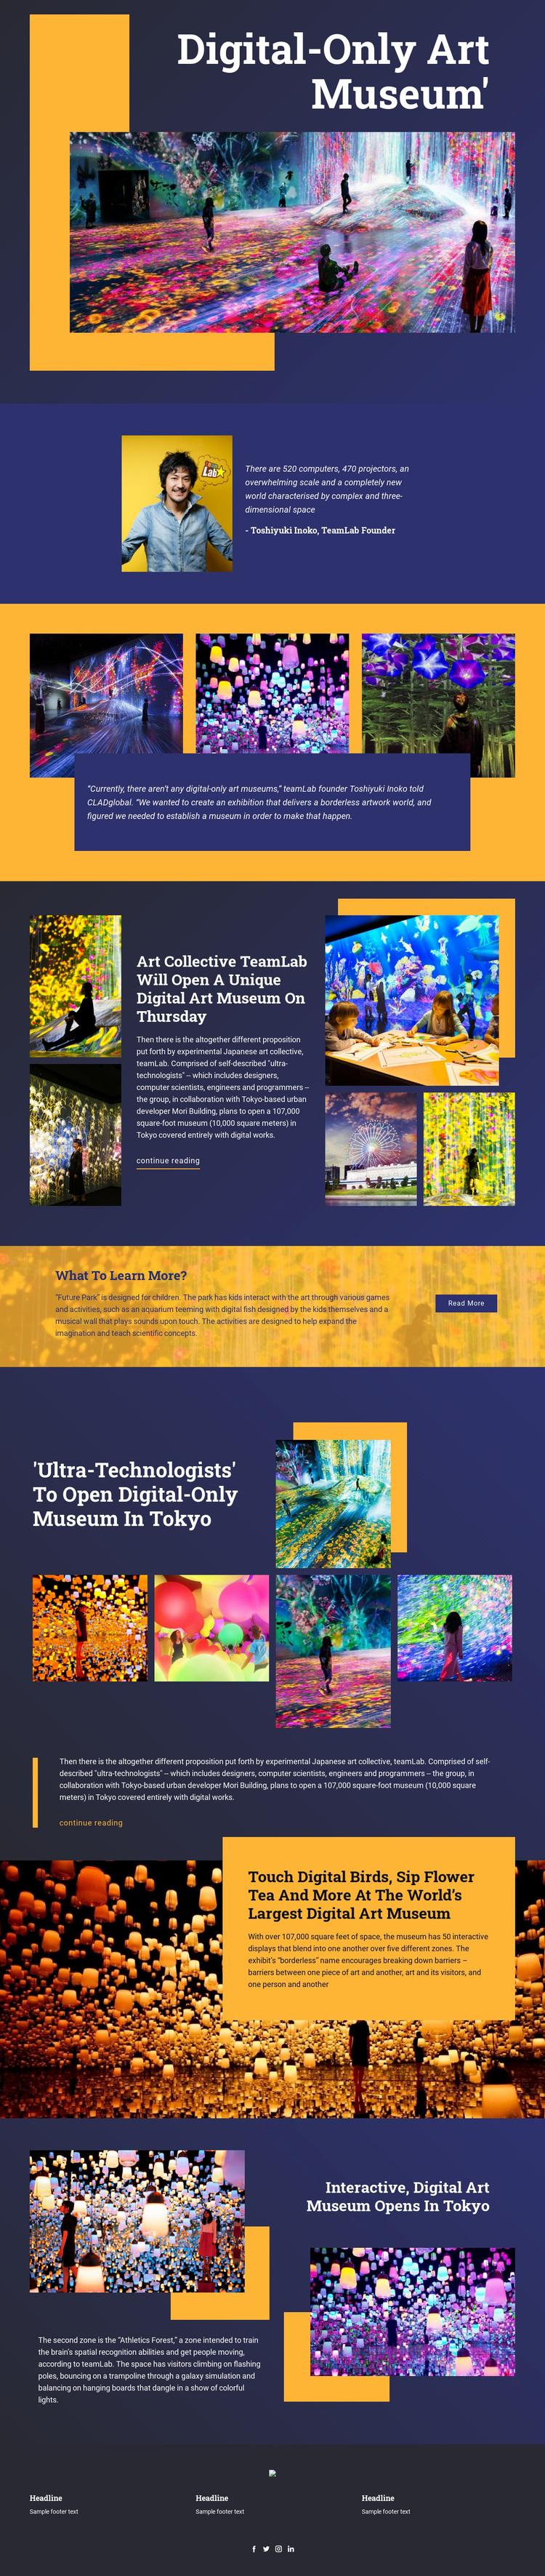 Digital Art Museum Web Page Designer